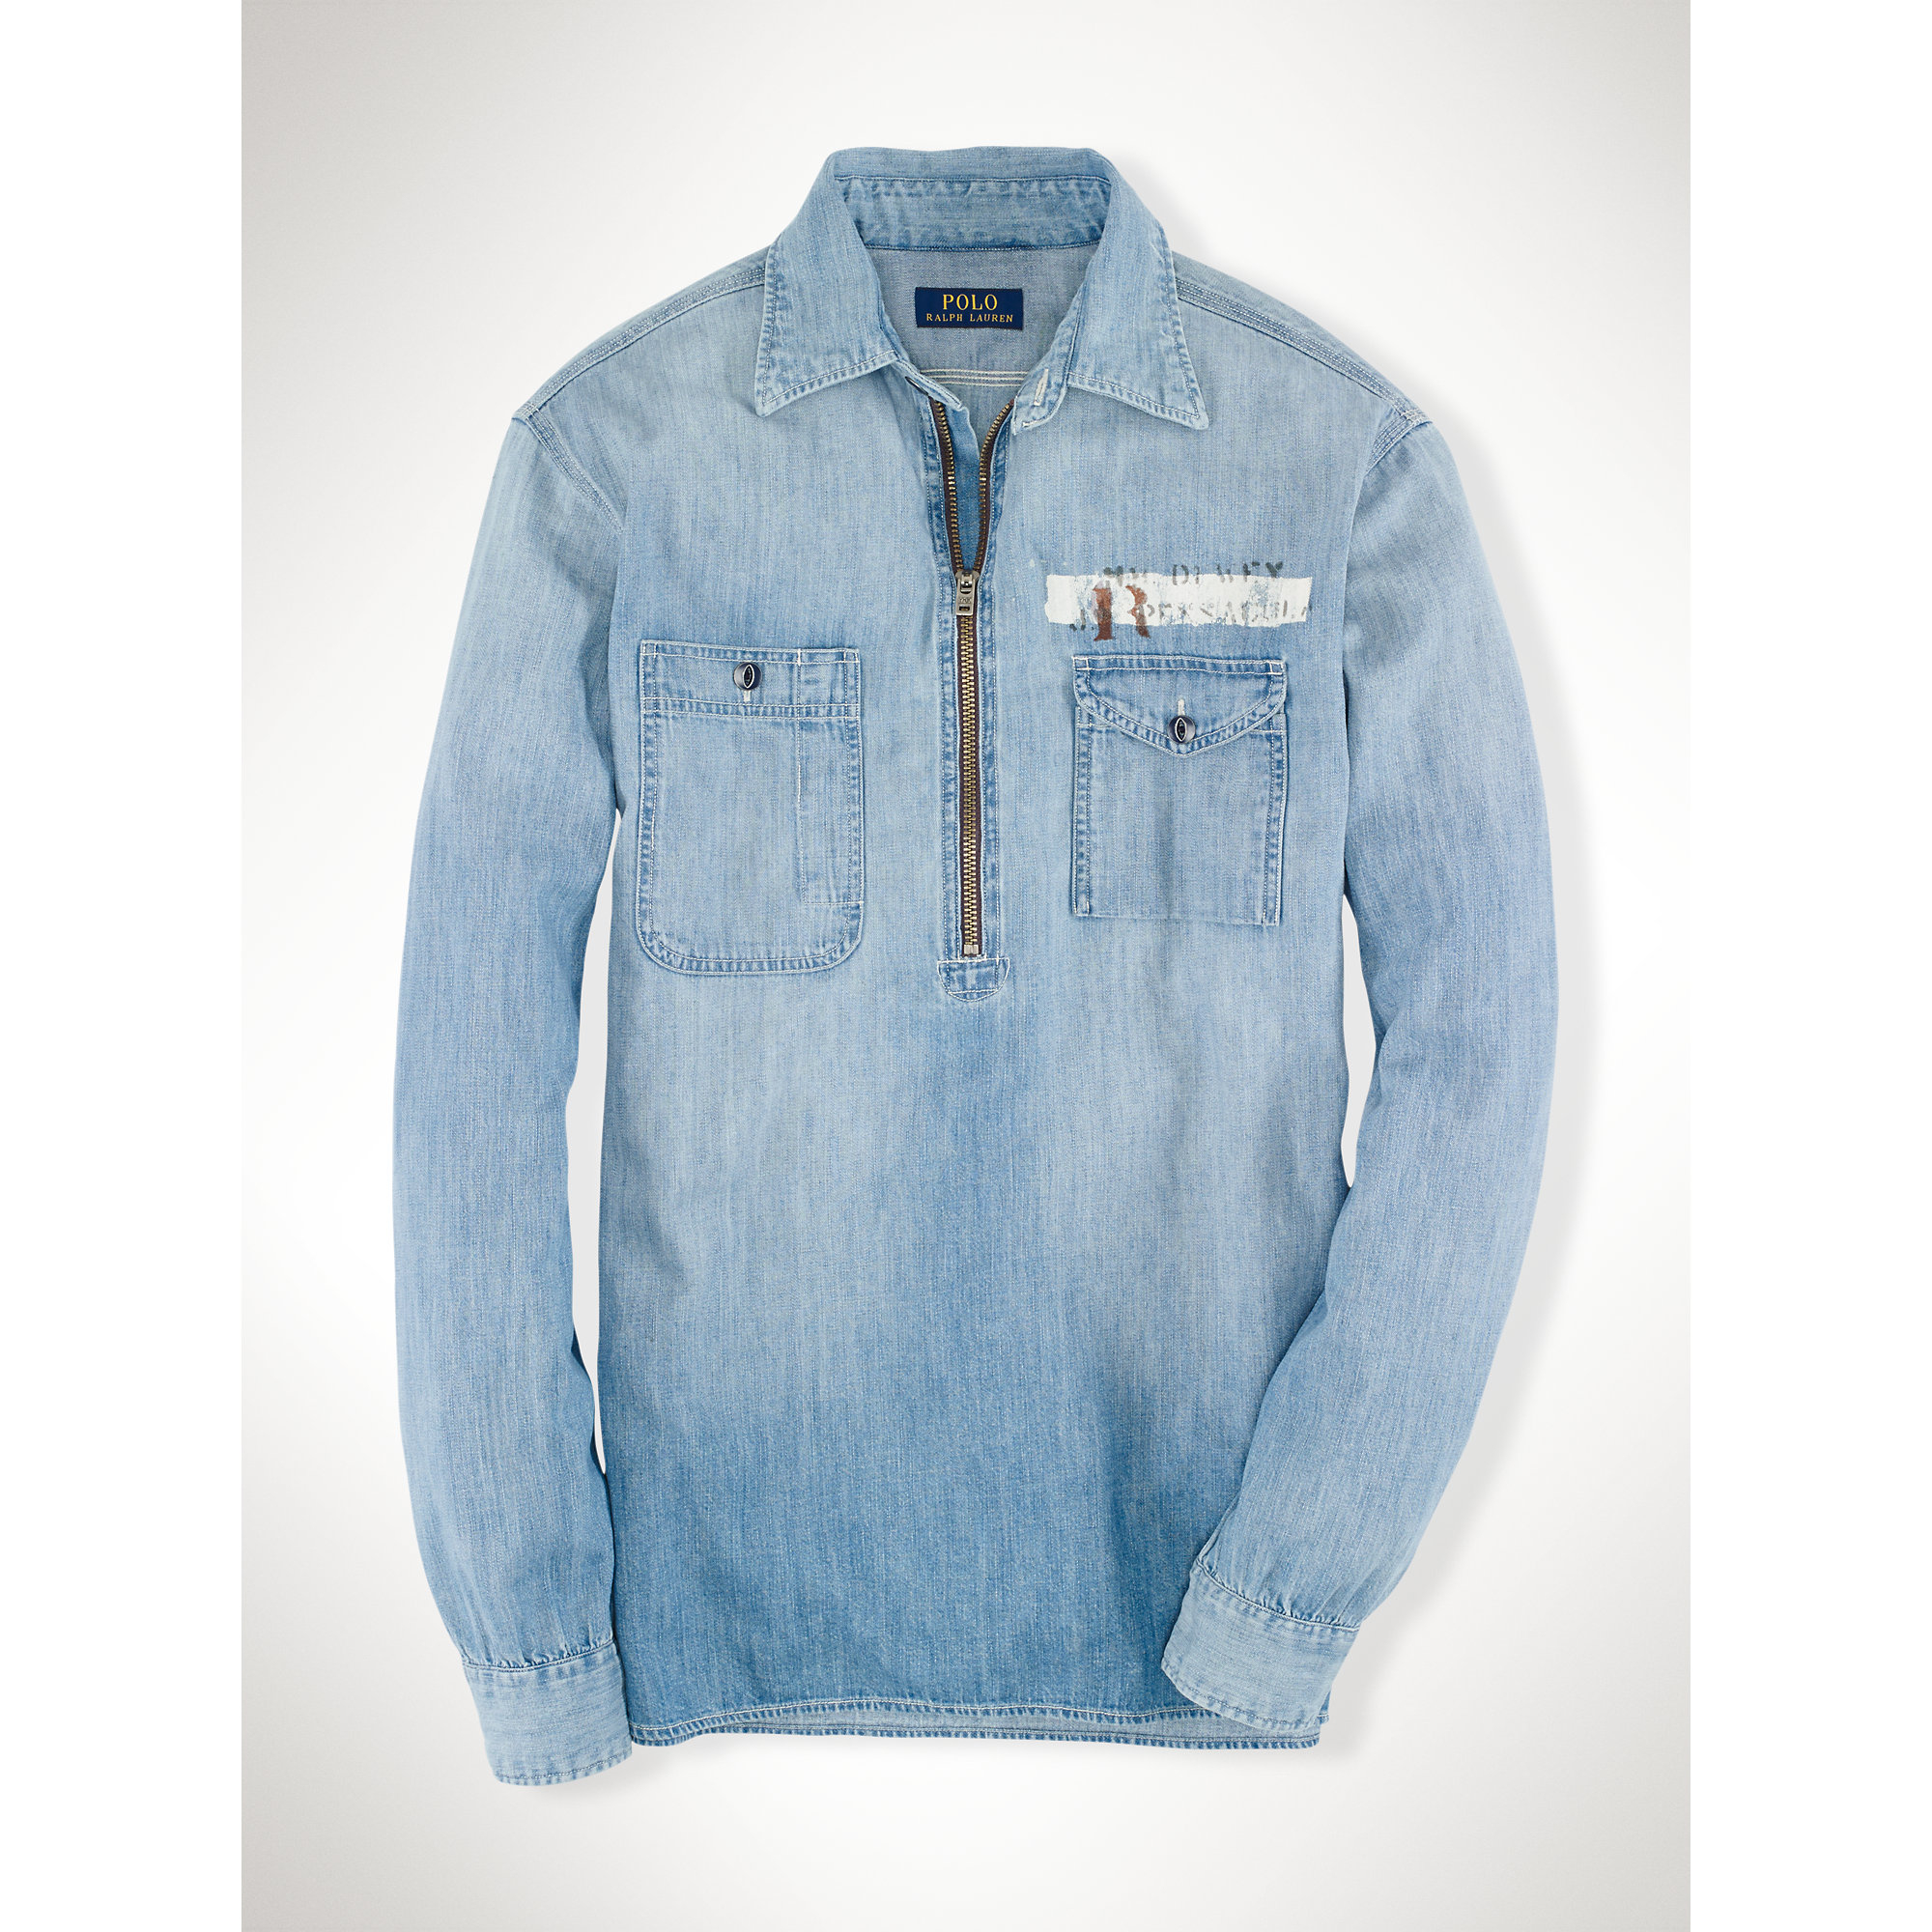 polo ralph lauren denim pullover shirt in blue for men indigo denim. Black Bedroom Furniture Sets. Home Design Ideas